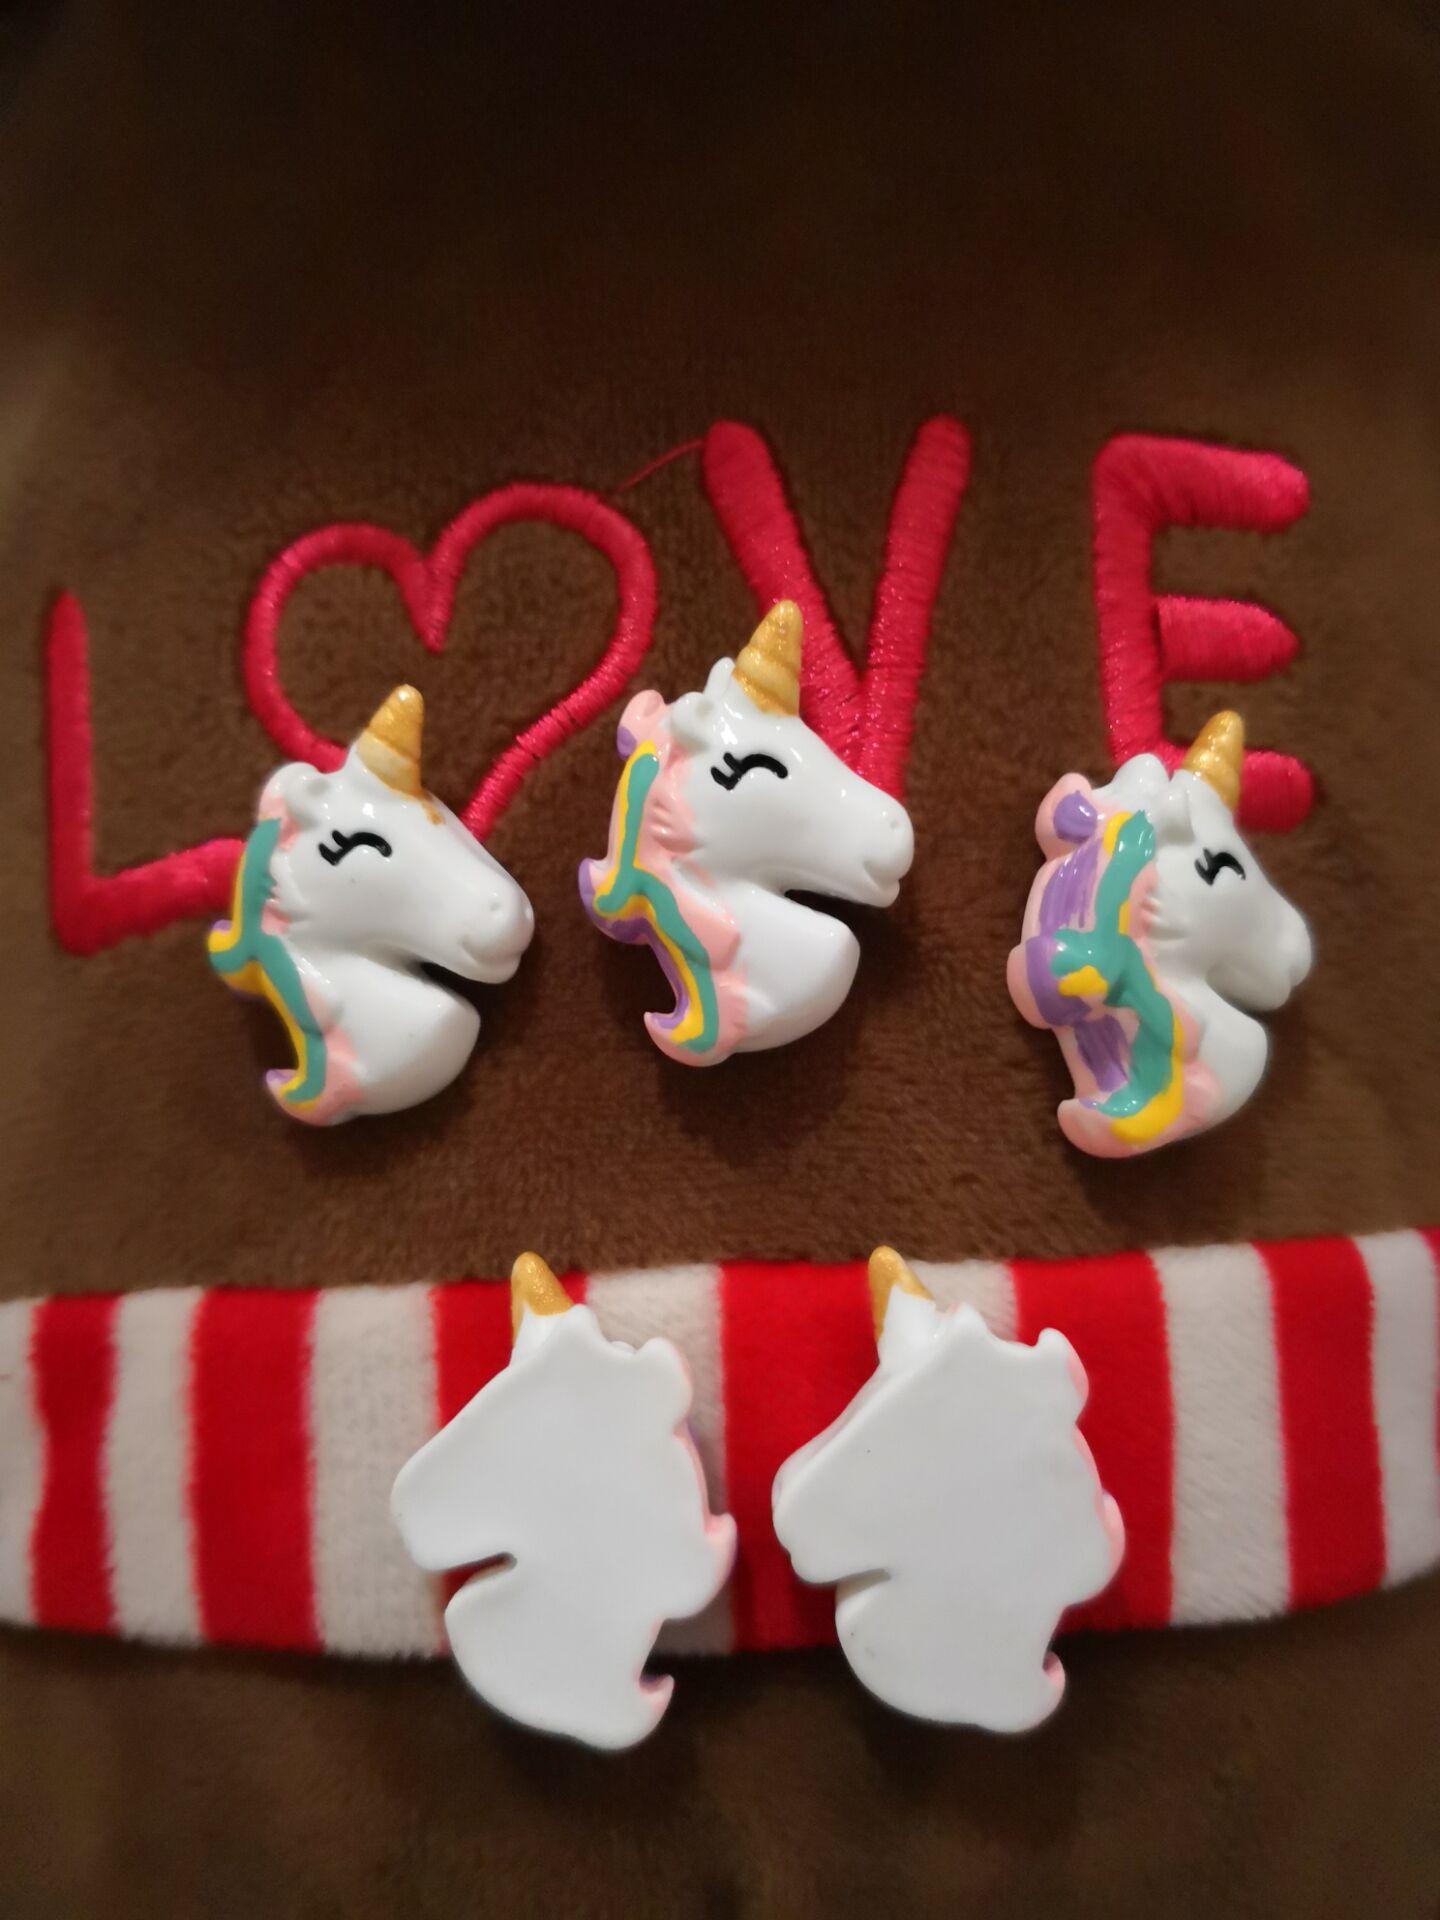 5 10pcs Lovely Unicorn Resin Flatbacks Craft Cardmaking Embellishments DJS-A0000